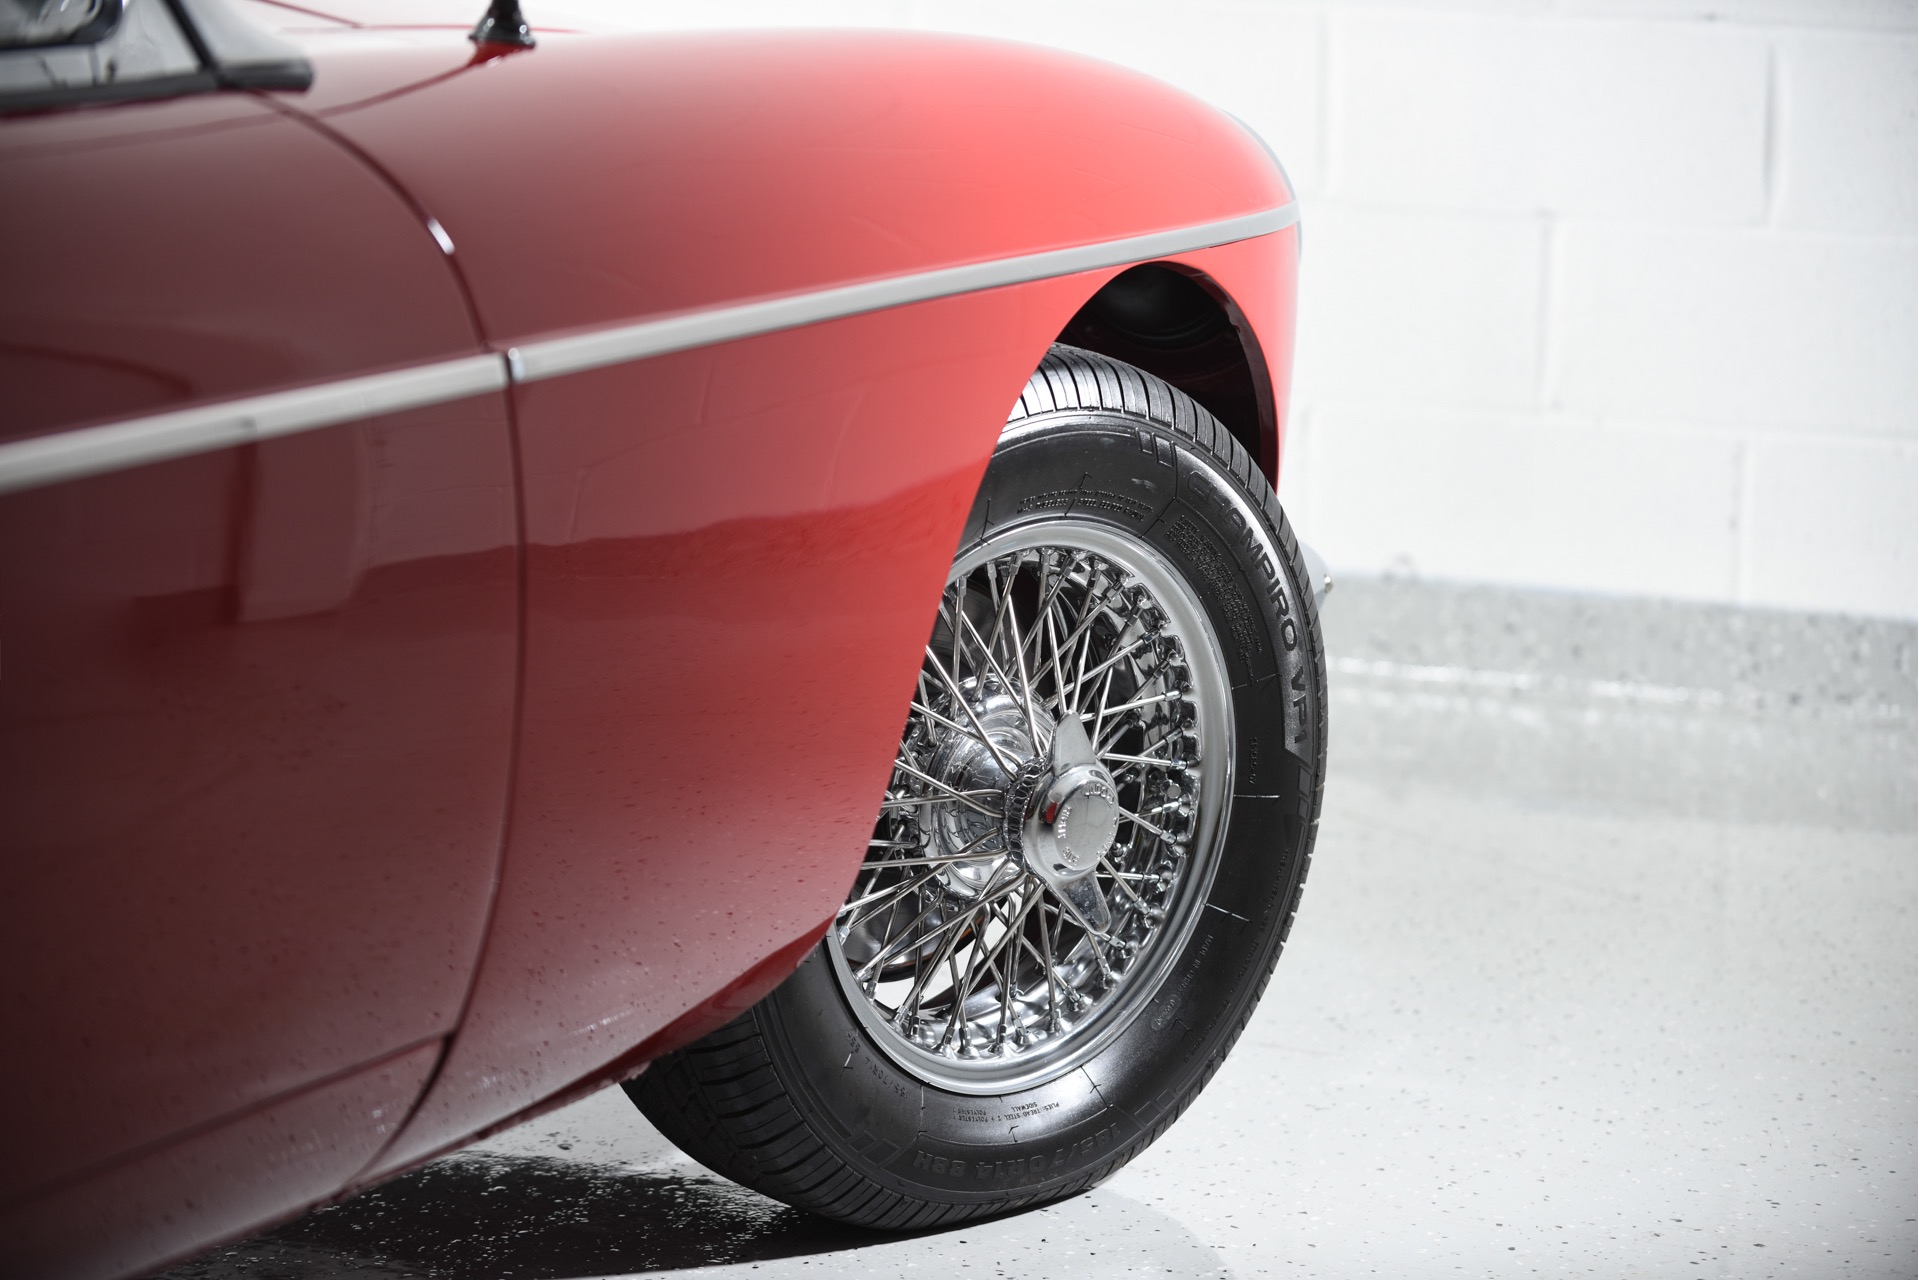 1967 MG MGB Roadster